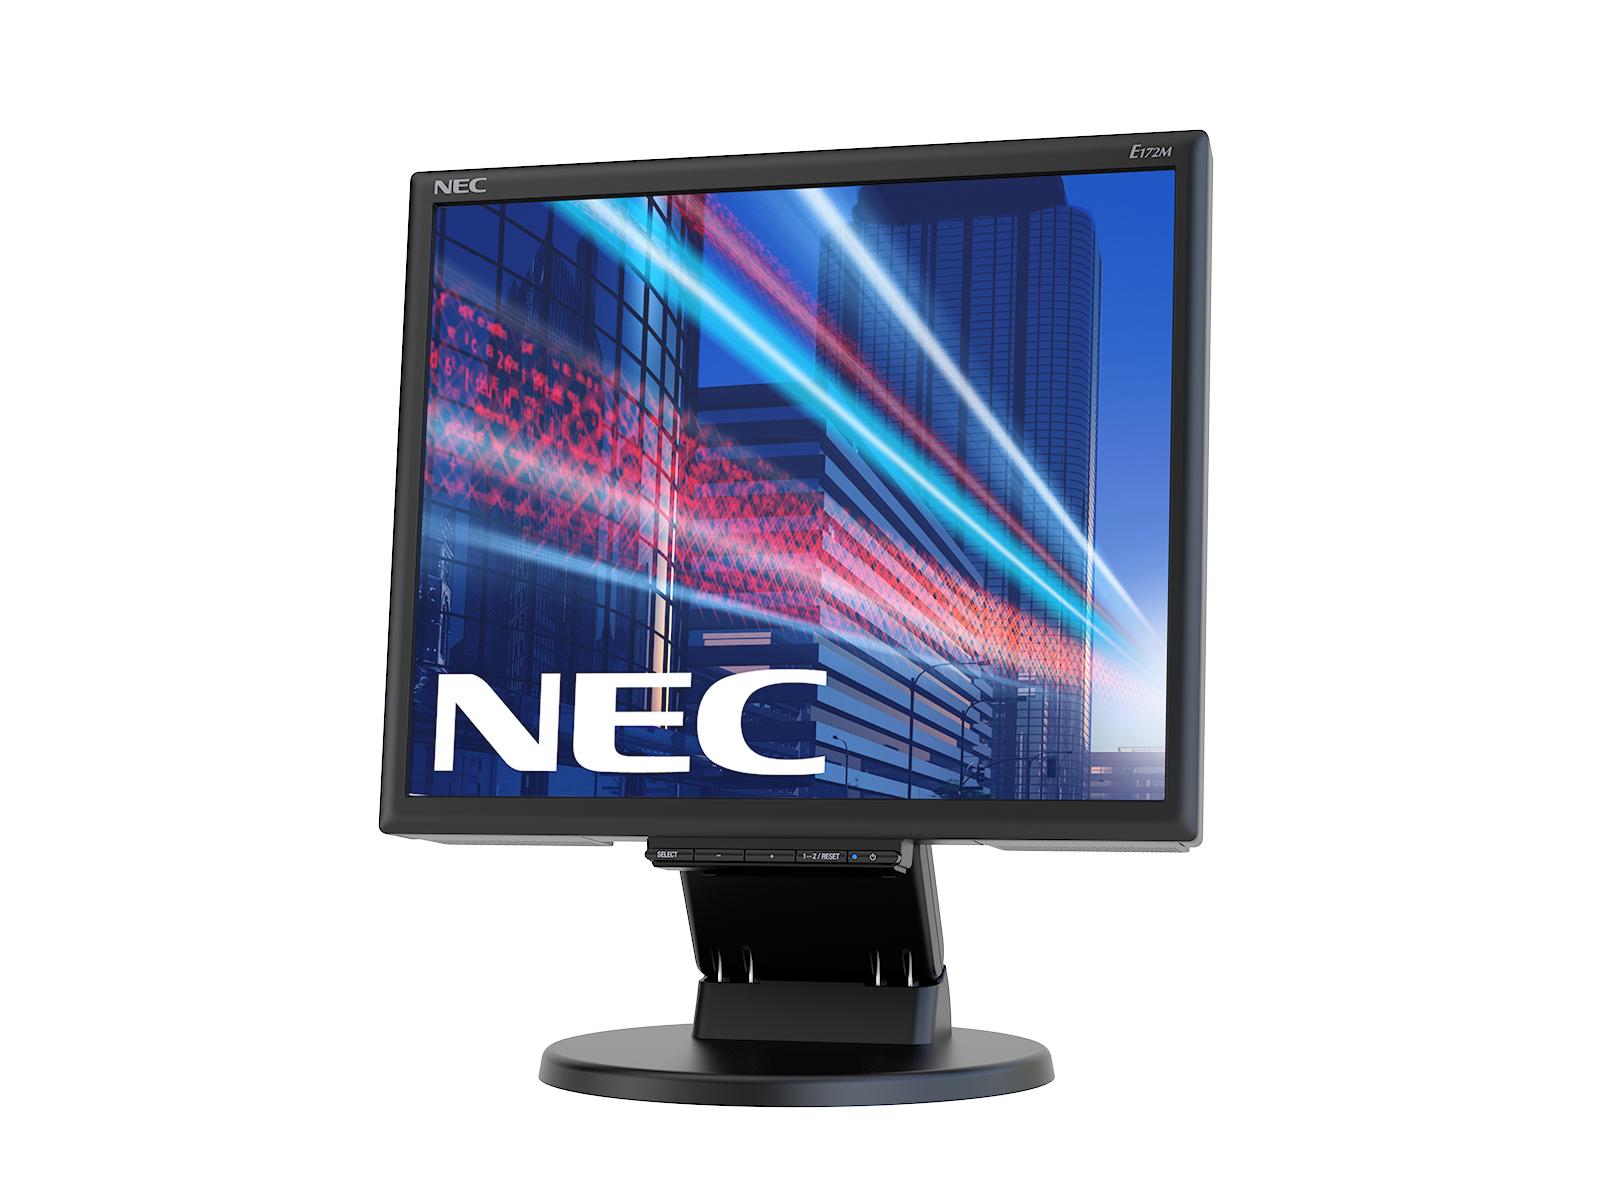 17'' LED NEC V-Touch 1723 5U - 5-žilový, VGA, DP, HDMI, USB